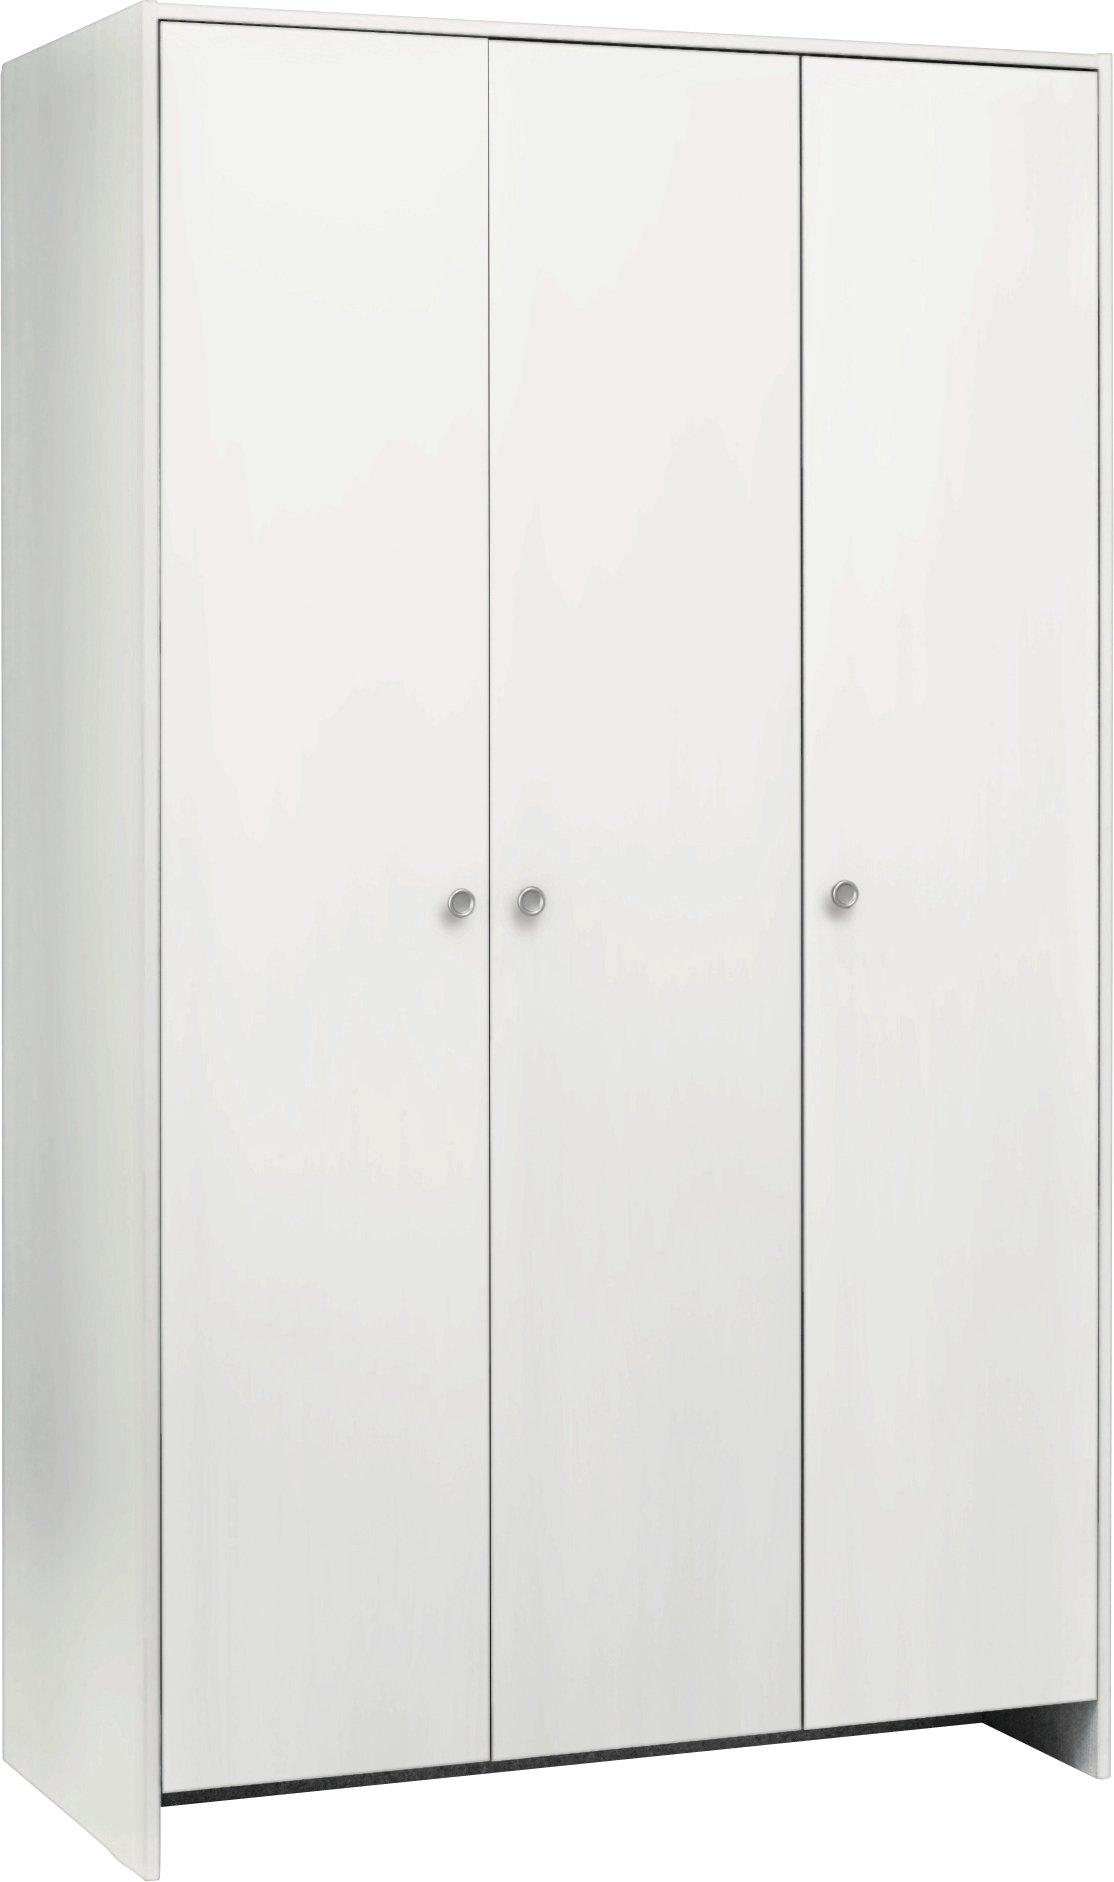 Argos Home Seville 3 Door Wardrobe